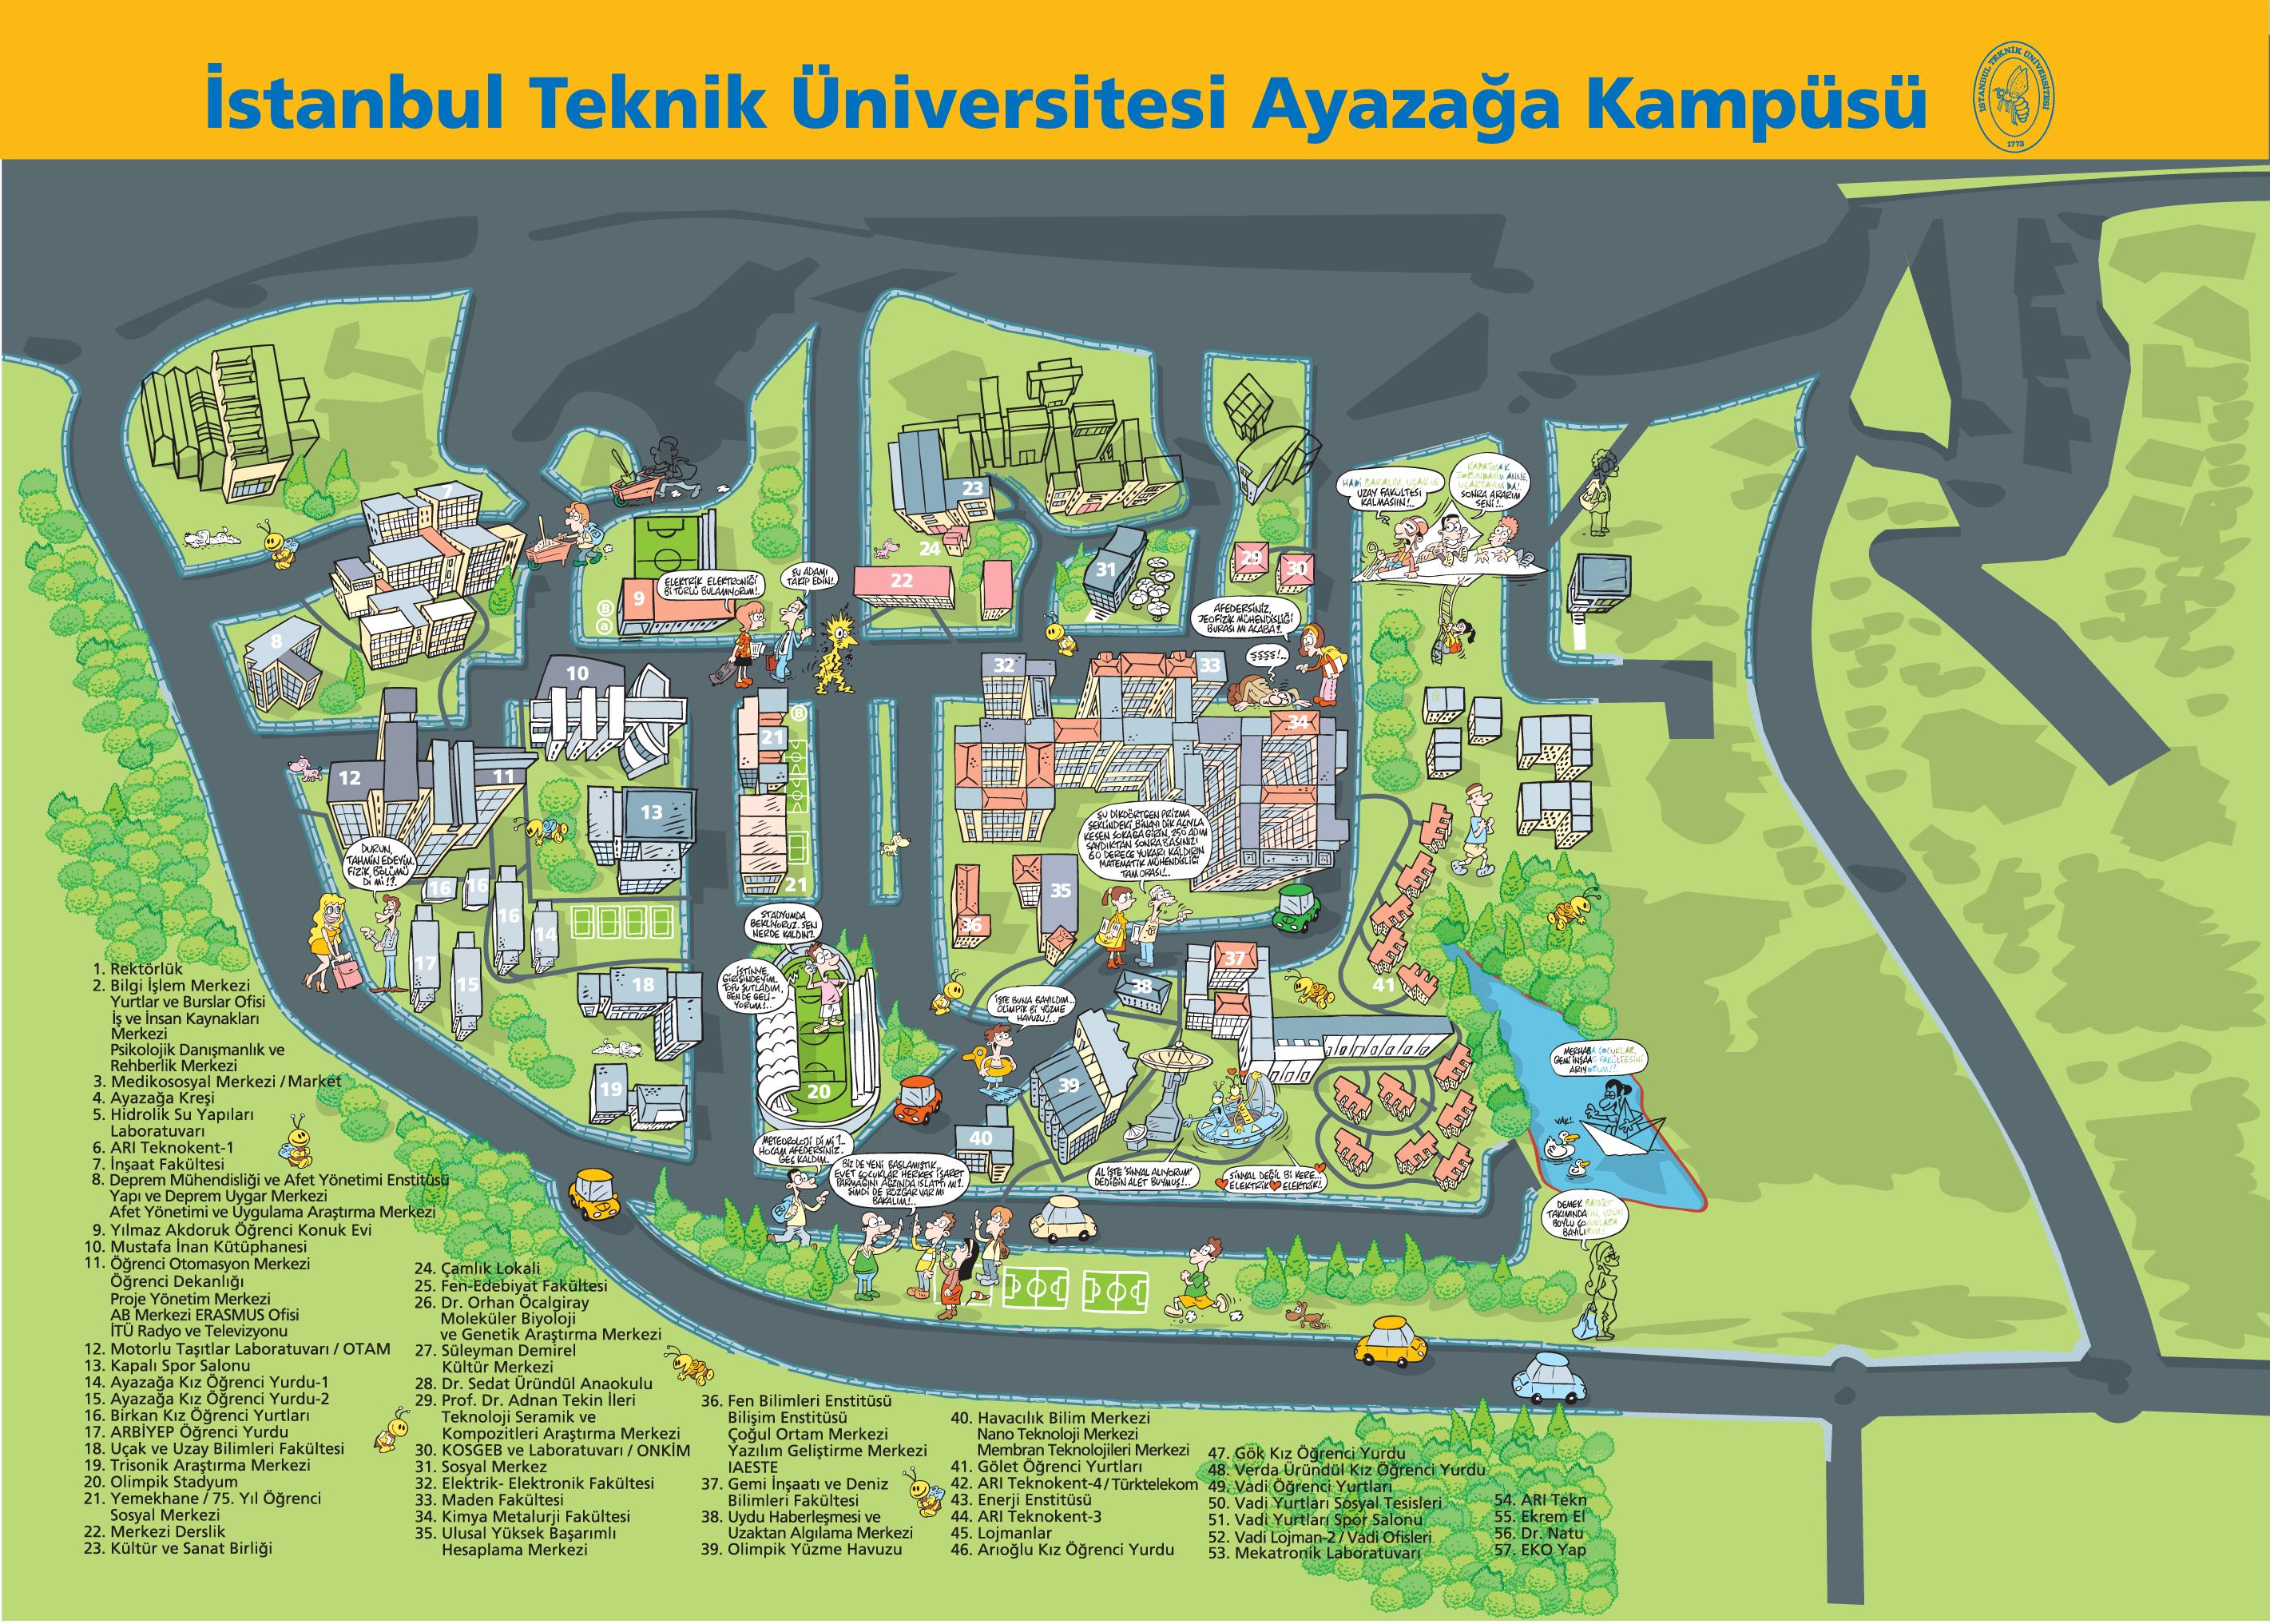 Istanbul Teknik Universitesi Panosundaki Pin